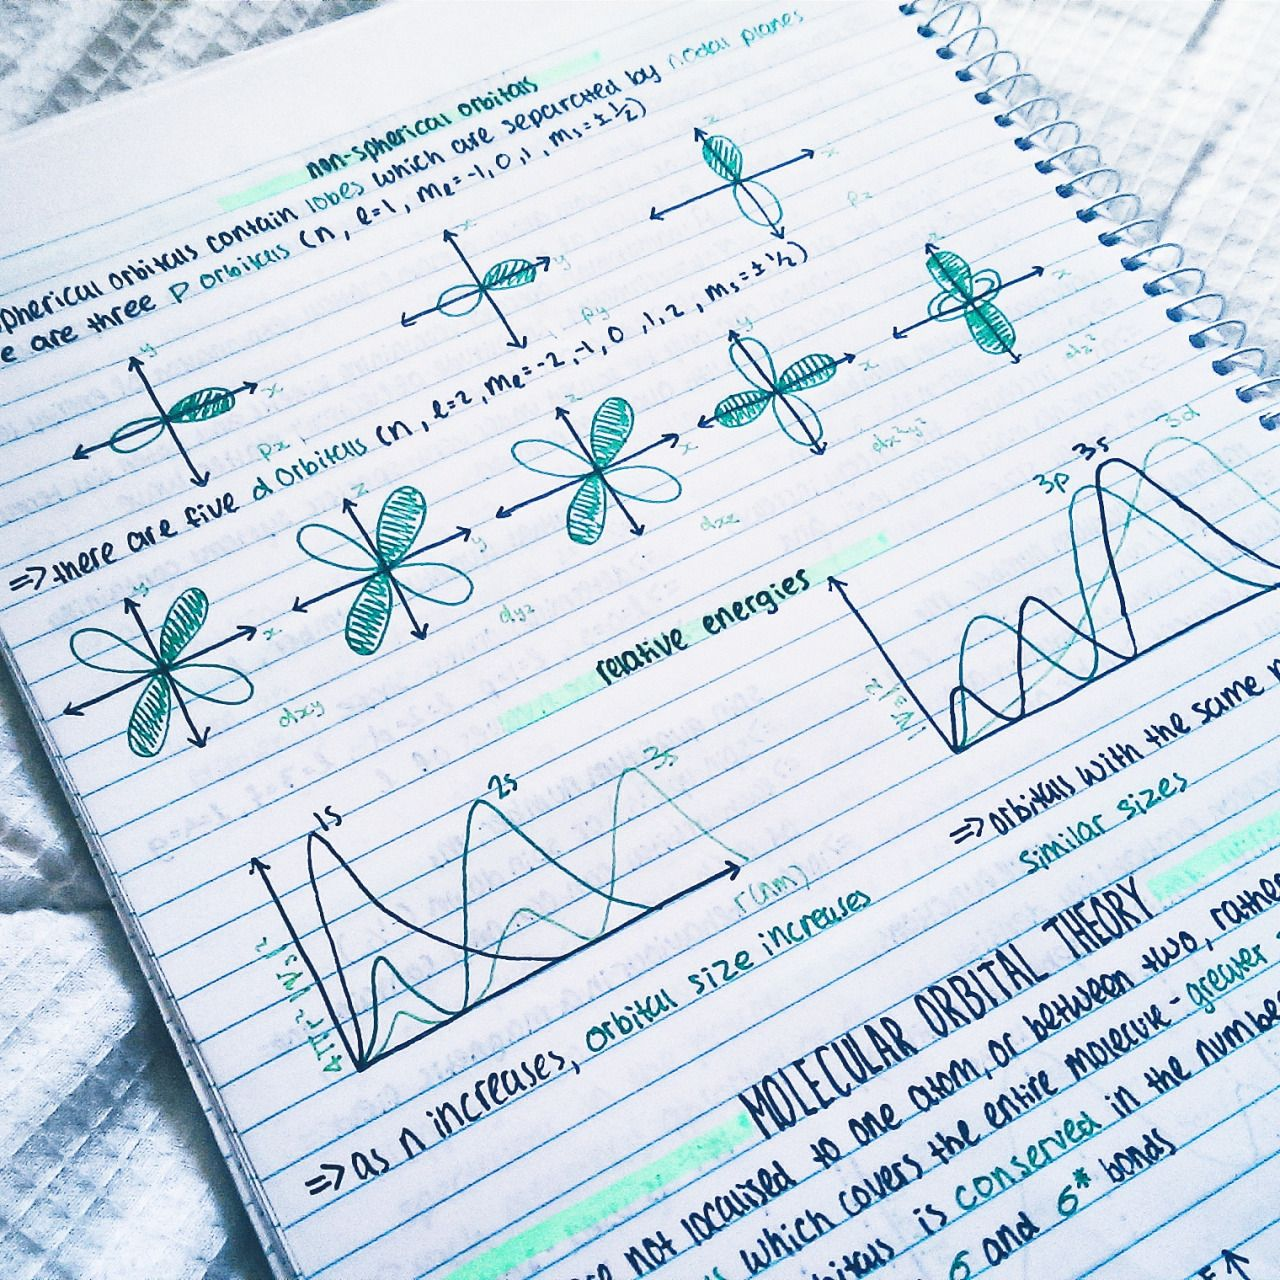 Year 9 chemistry homework help